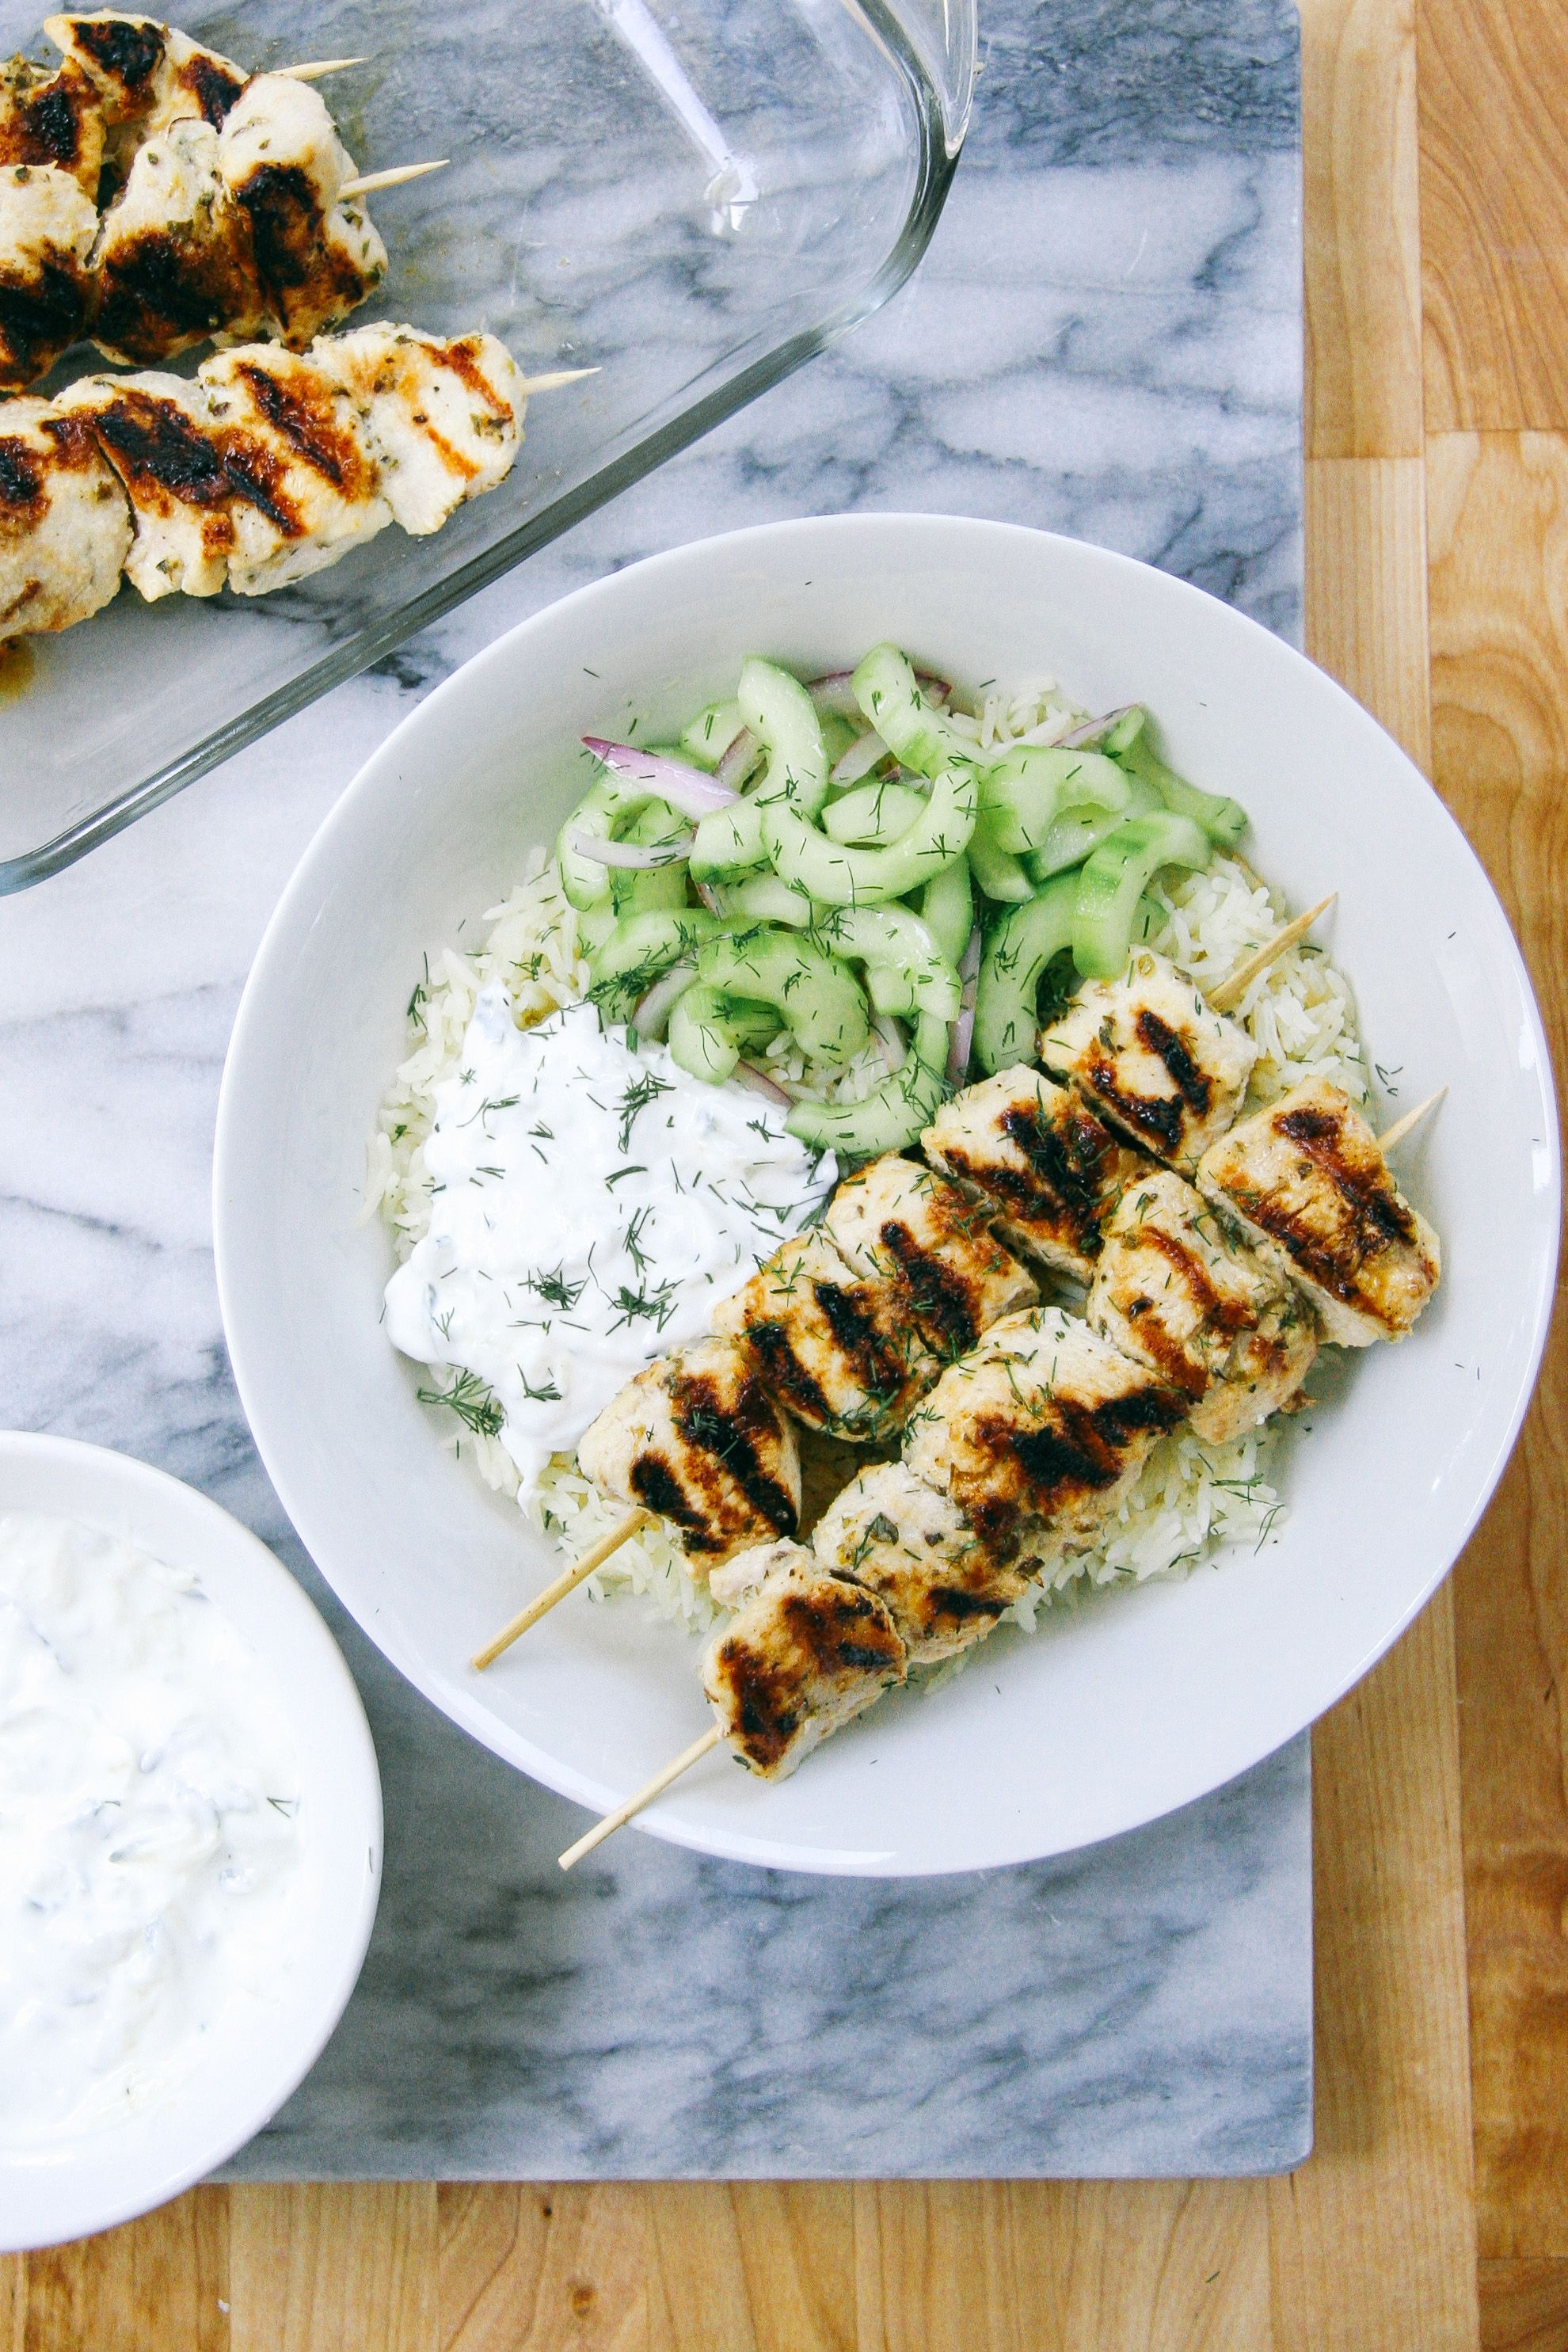 Grilled Chicken Kebab Bowls with Cucumber salad and Tzatziki made with Greek Yogurt.